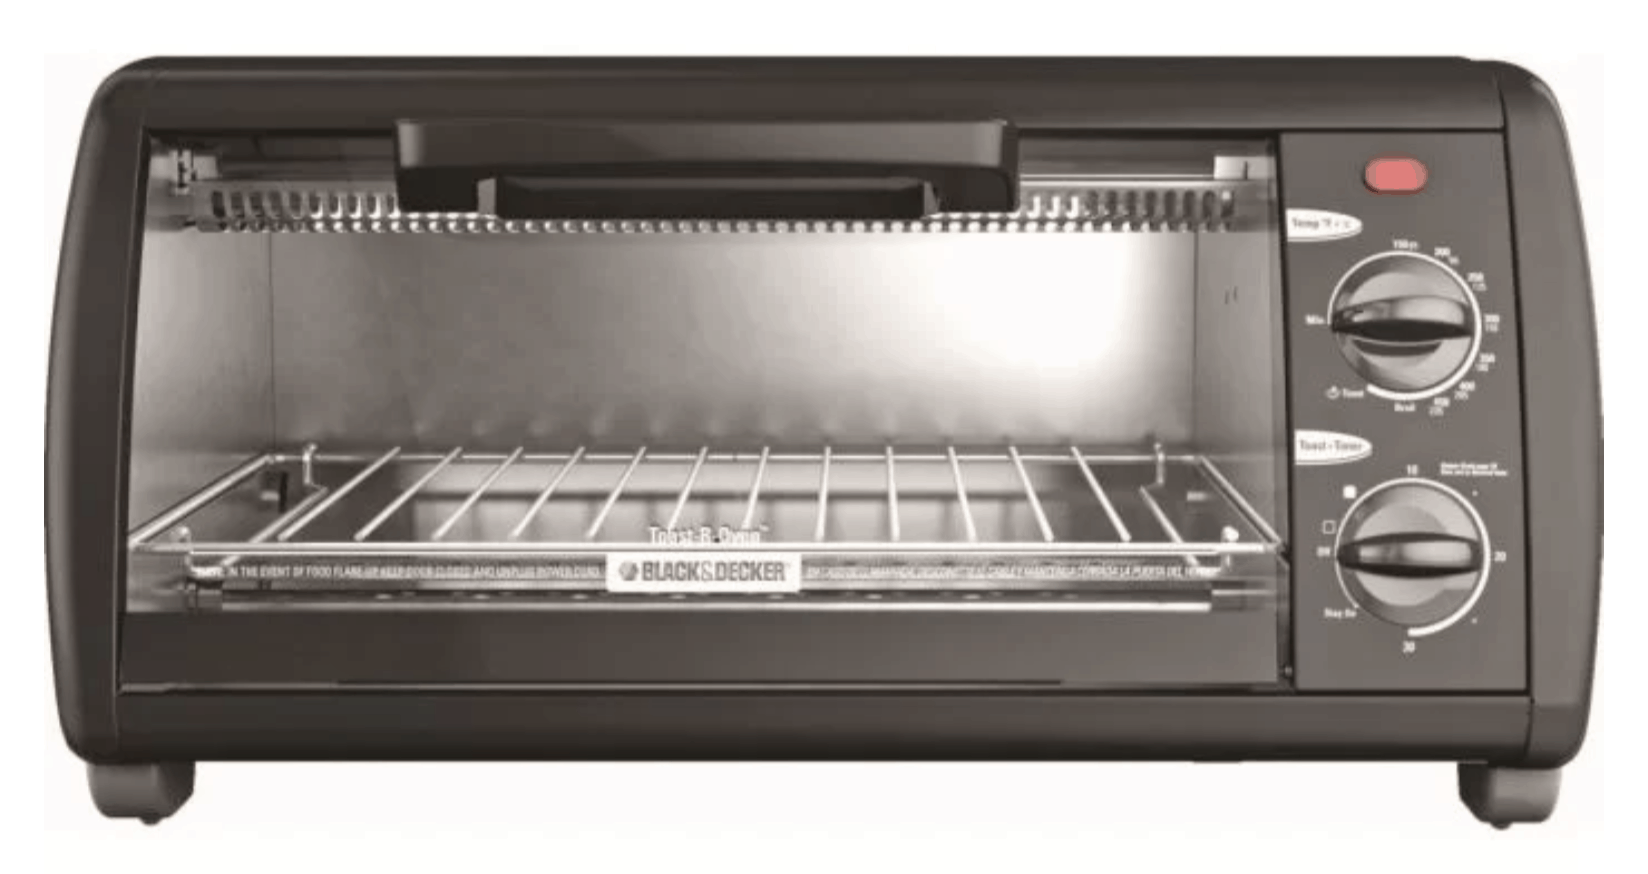 Sleek Black & Decker toaster oven in black